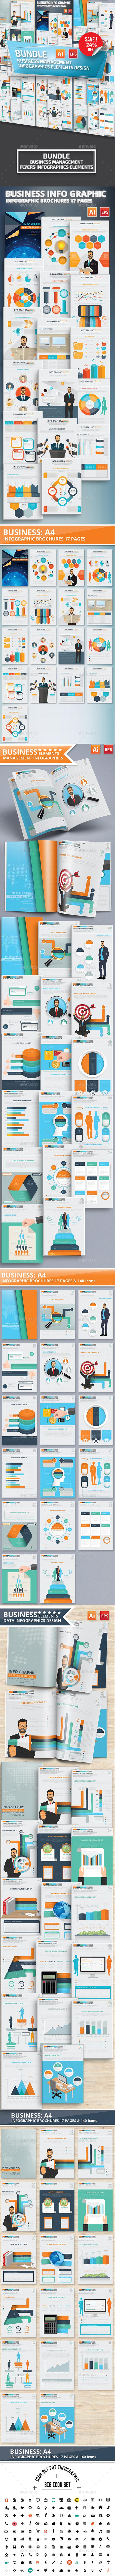 Bundle Business Management Infographics Design - Infographics